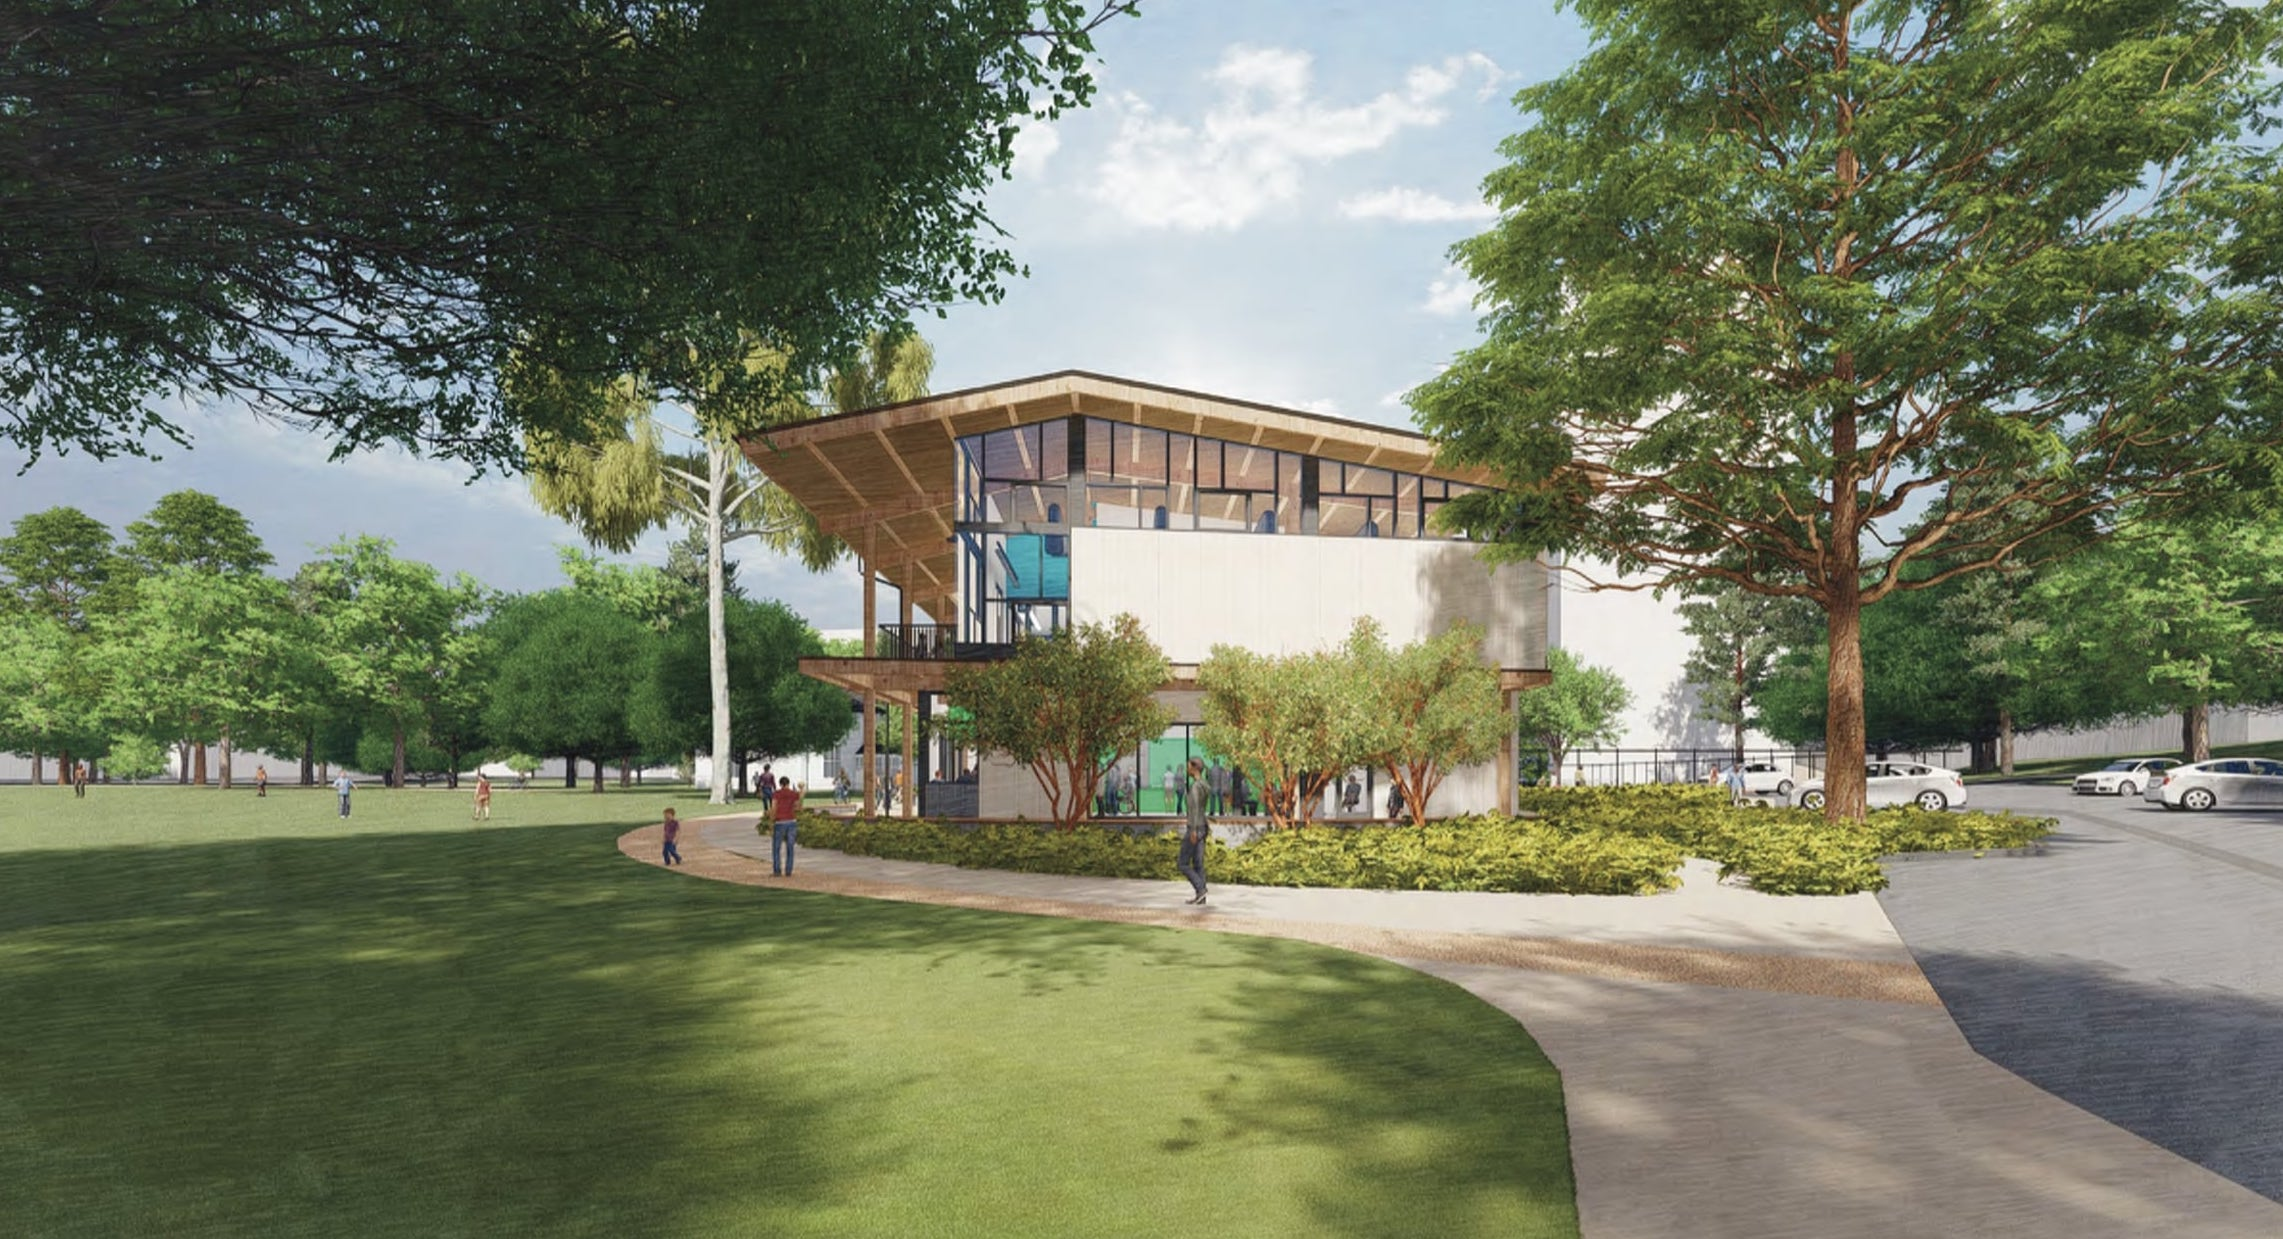 Mosswood Park Community Center